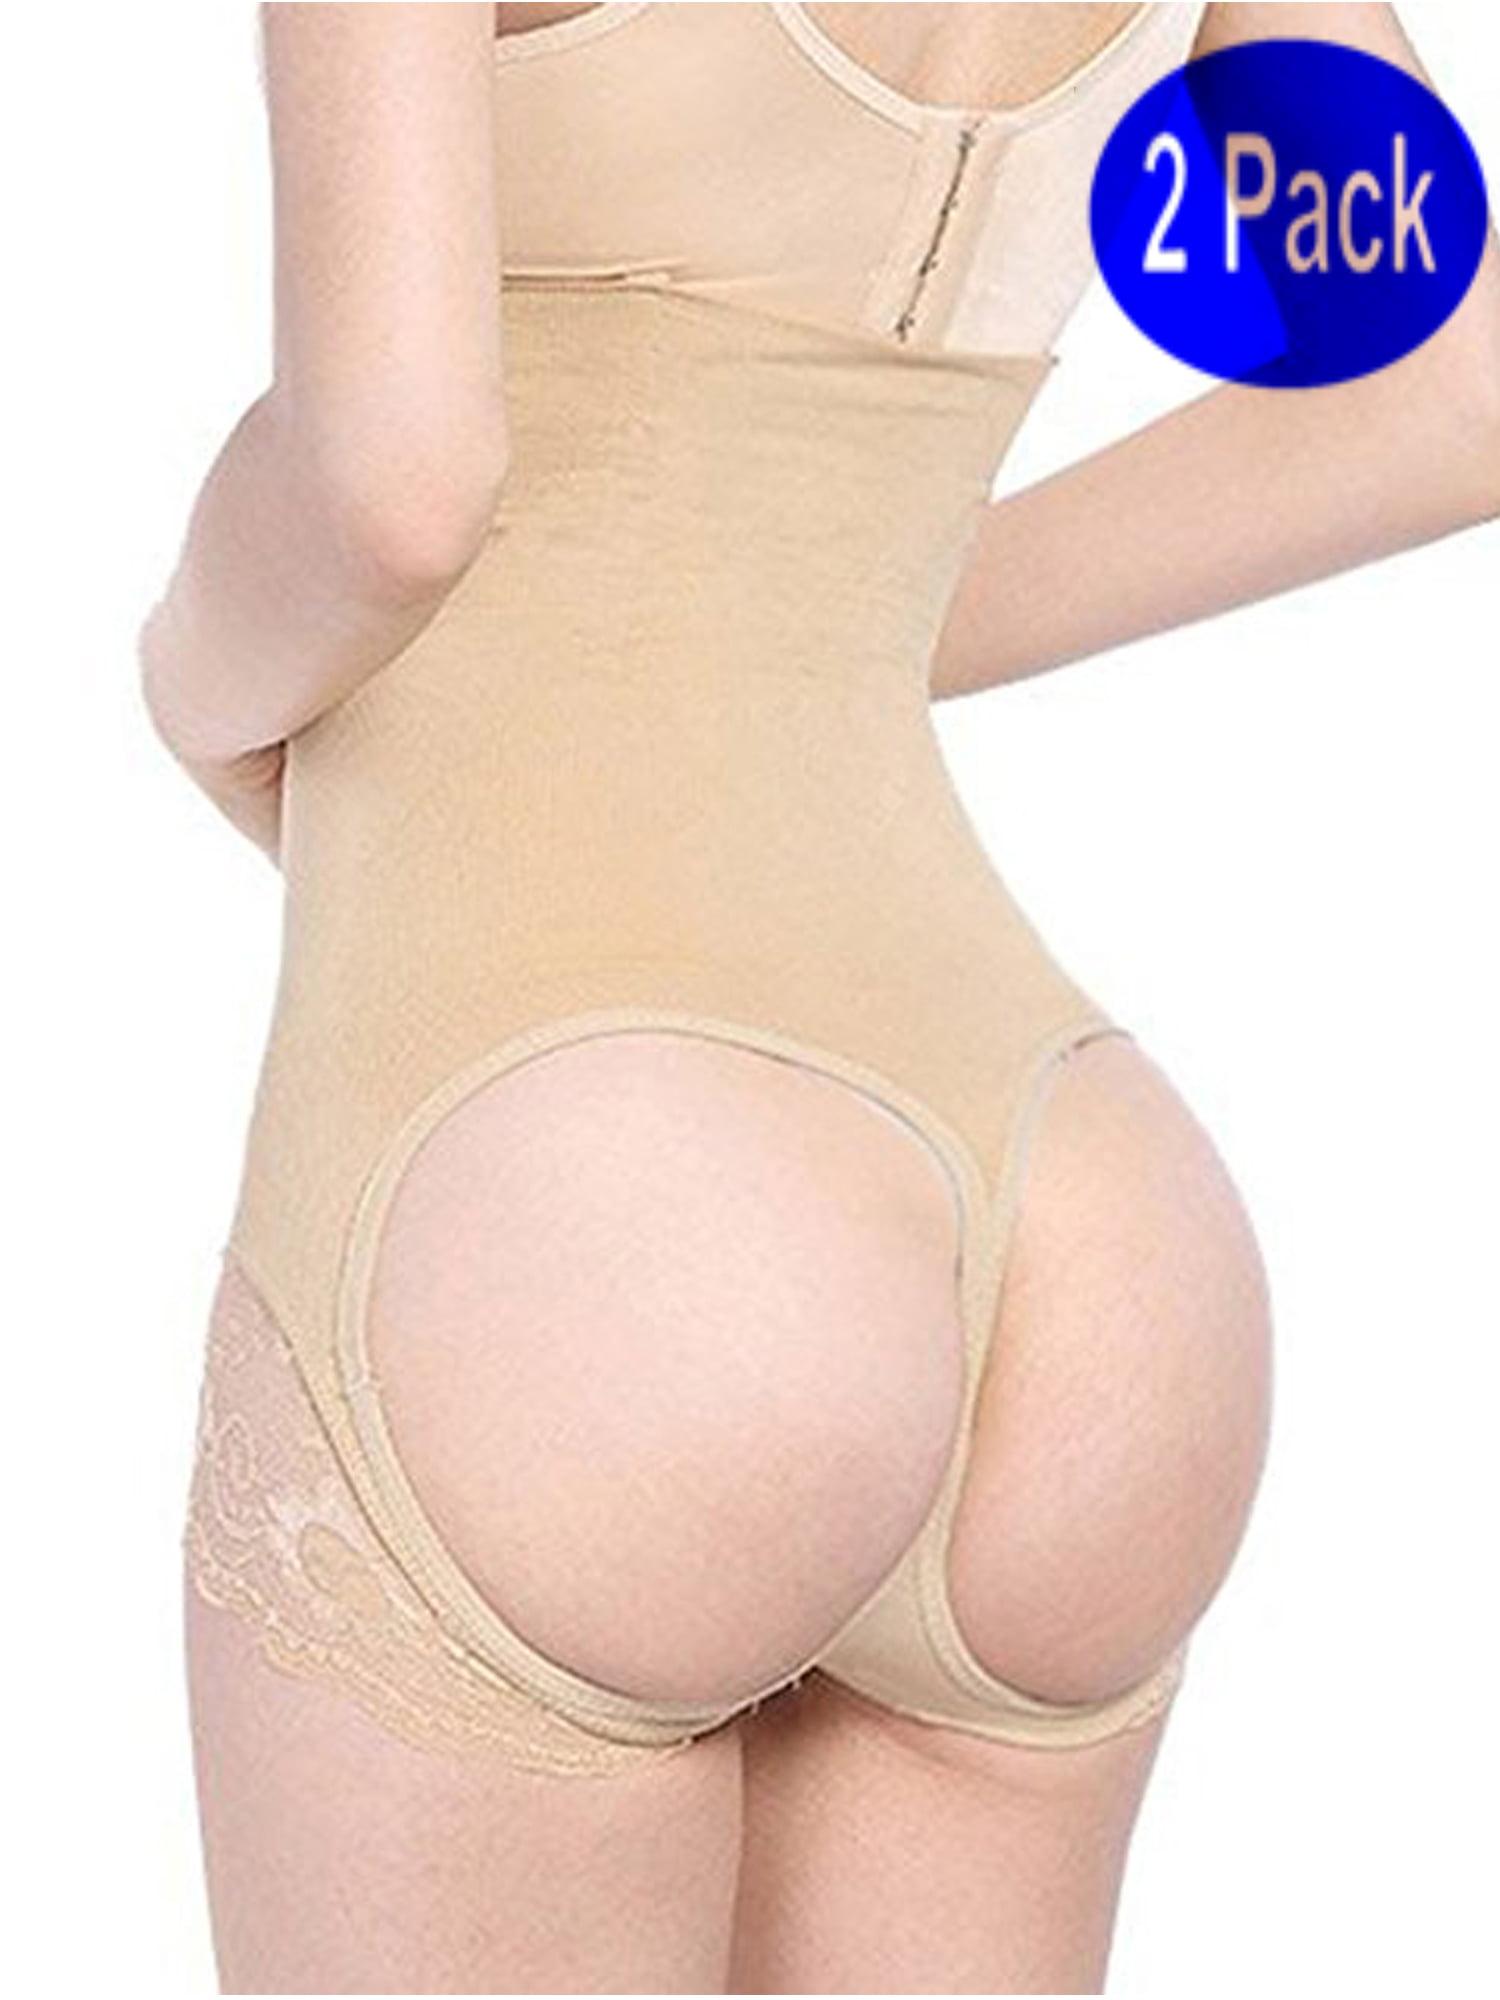 0df55edb808 Lelinta - LELINTA Women s High Waist Butt Lifter Boy Shorts Shapewear Butt  Enhancer Control Panties 2 Pack - Walmart.com